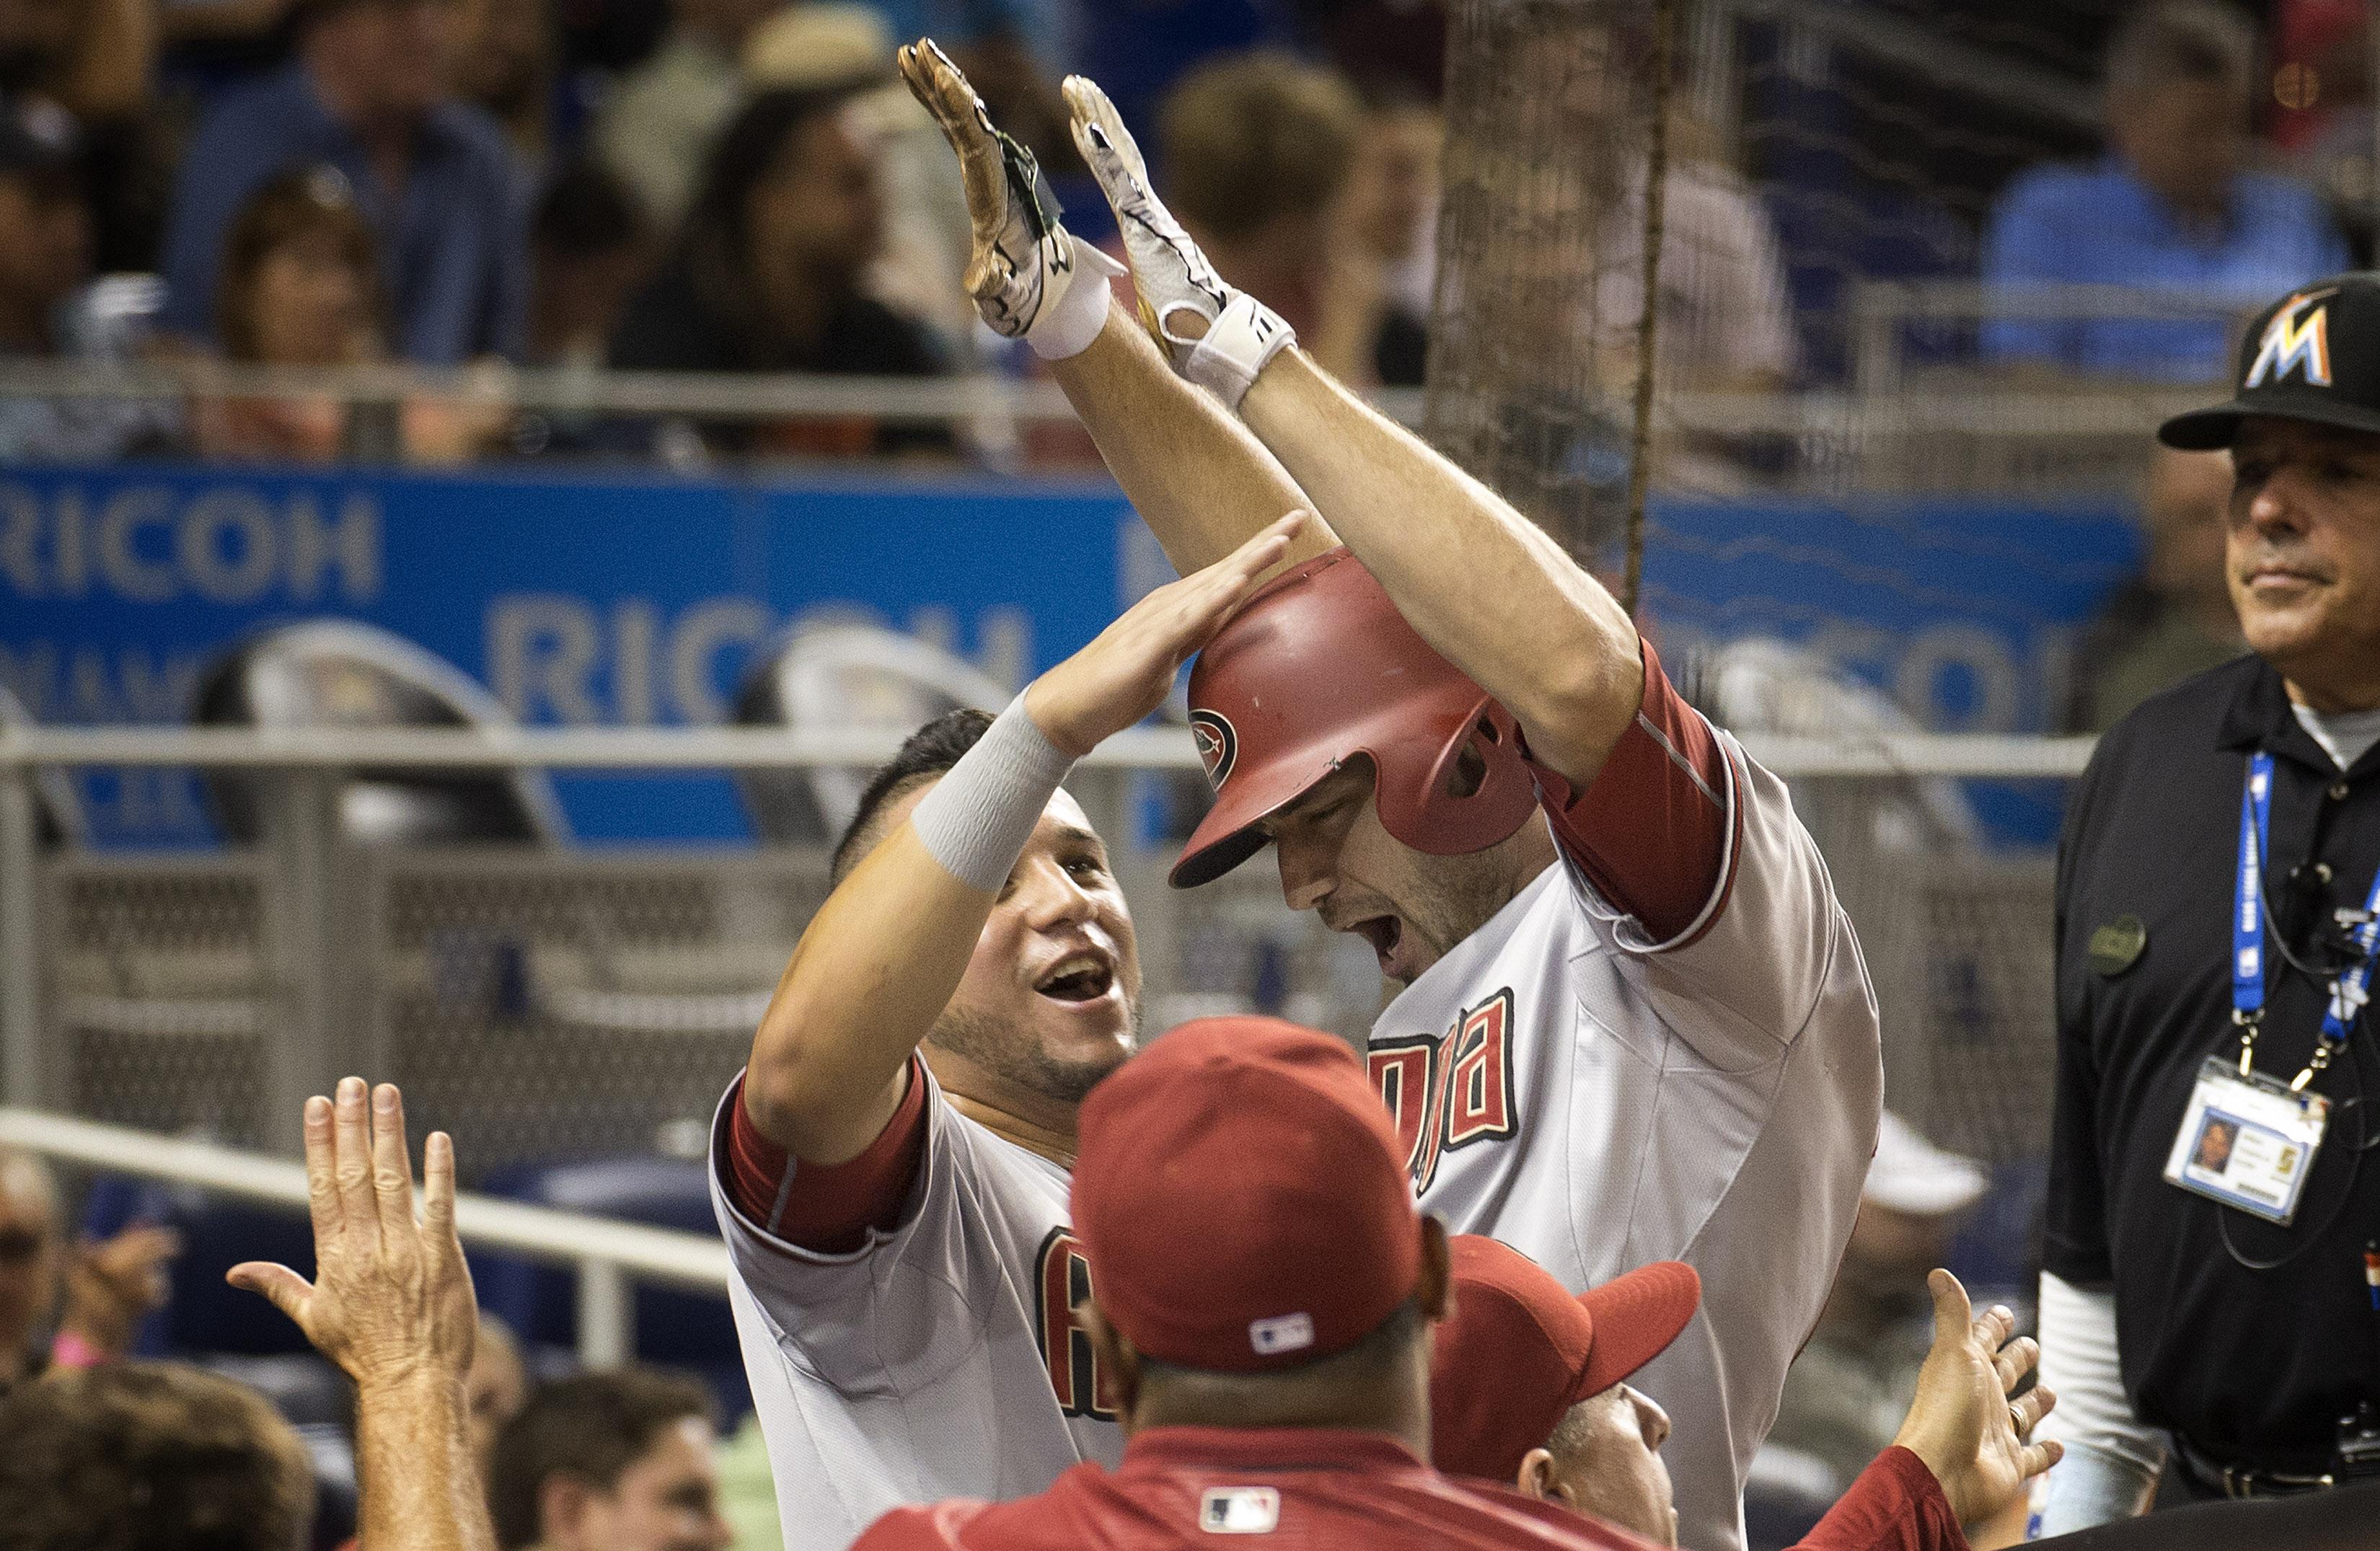 Arizona Diamondbacks'  David Peralta, left, celebrates with A.J. Pollock during the eighth inning of a baseball game against the Miami Marlins in Miami, Tuesday, May 19, 2015, after Pollock hit a go-ahead two-run home run. The Diamondbacks won 4-2. (AP Ph